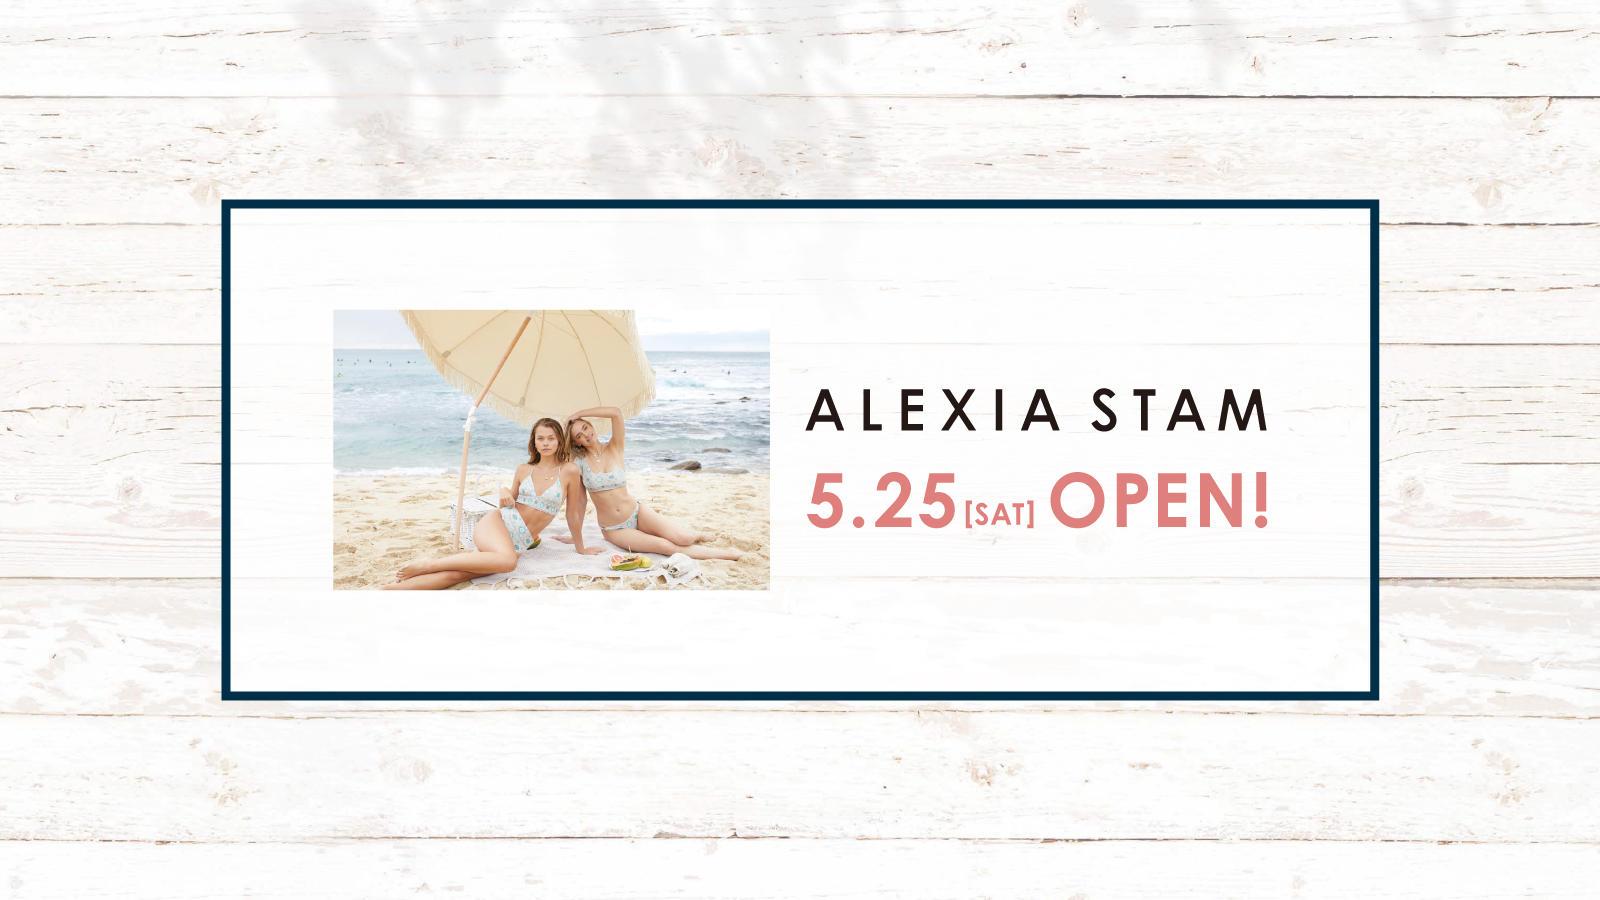 NEW SHOP 『ALEXIA STAM』 5.25sat  OPEN!!